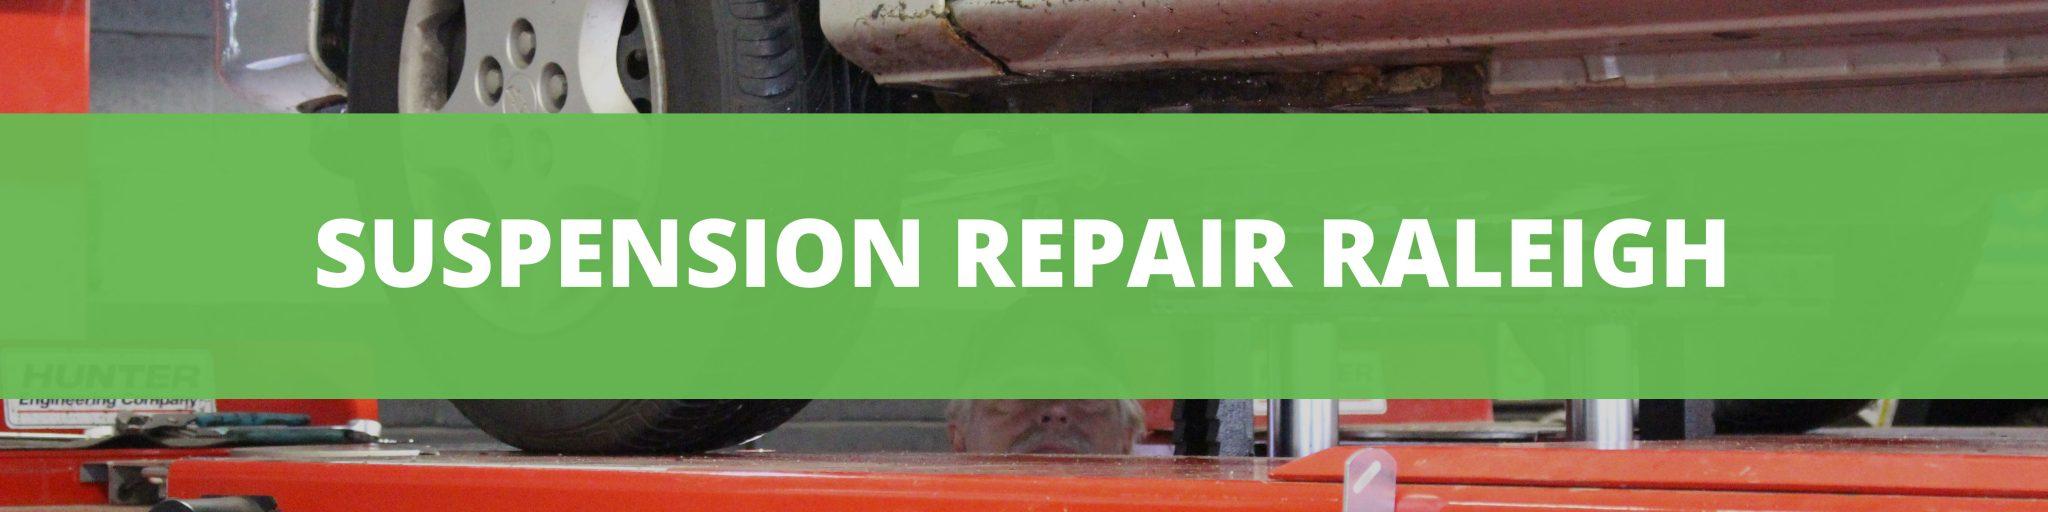 suspension repair raleigh